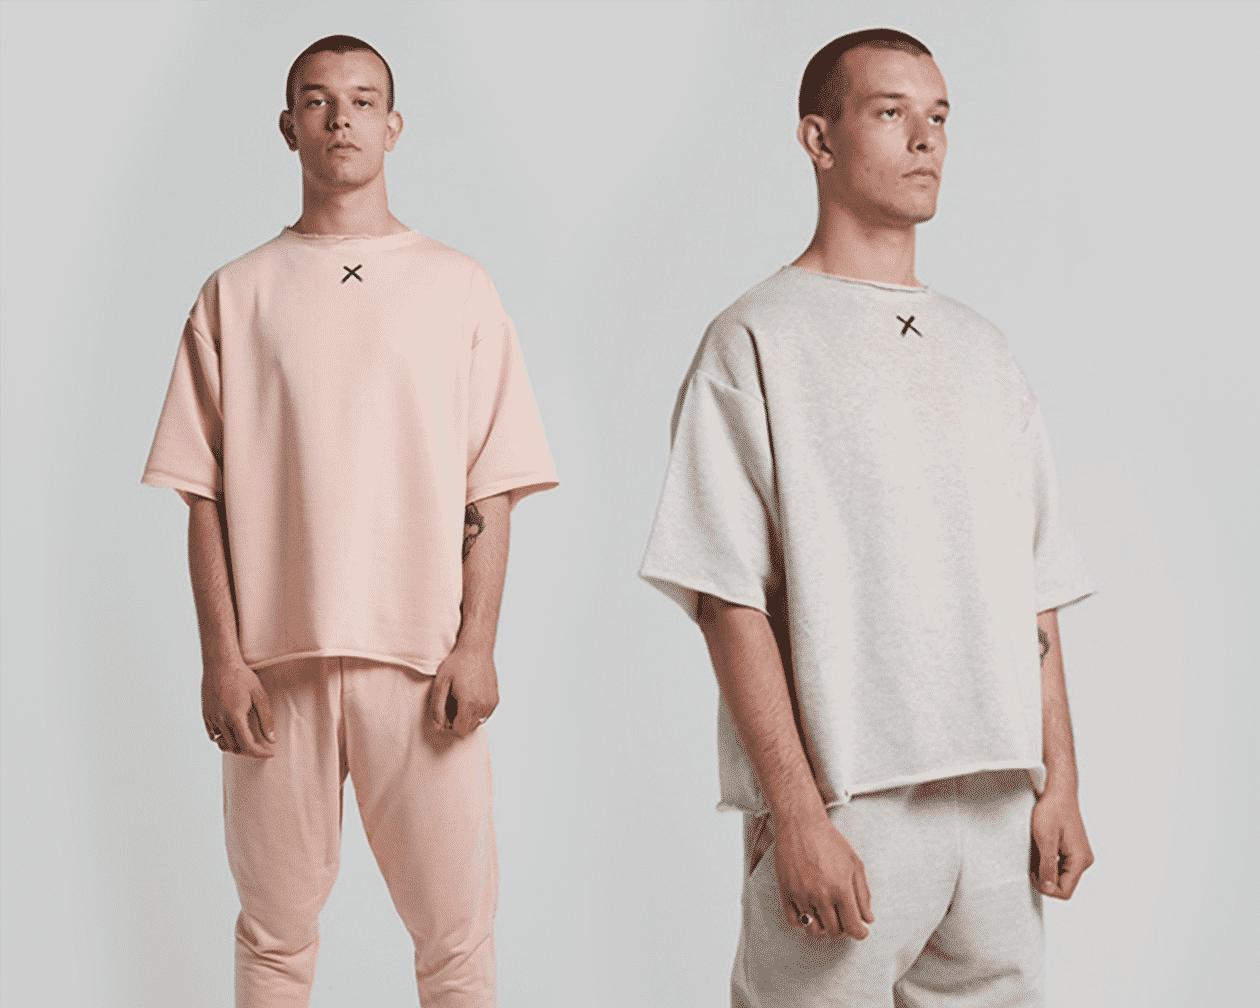 Conx Ecommerce Clothing Model Shots